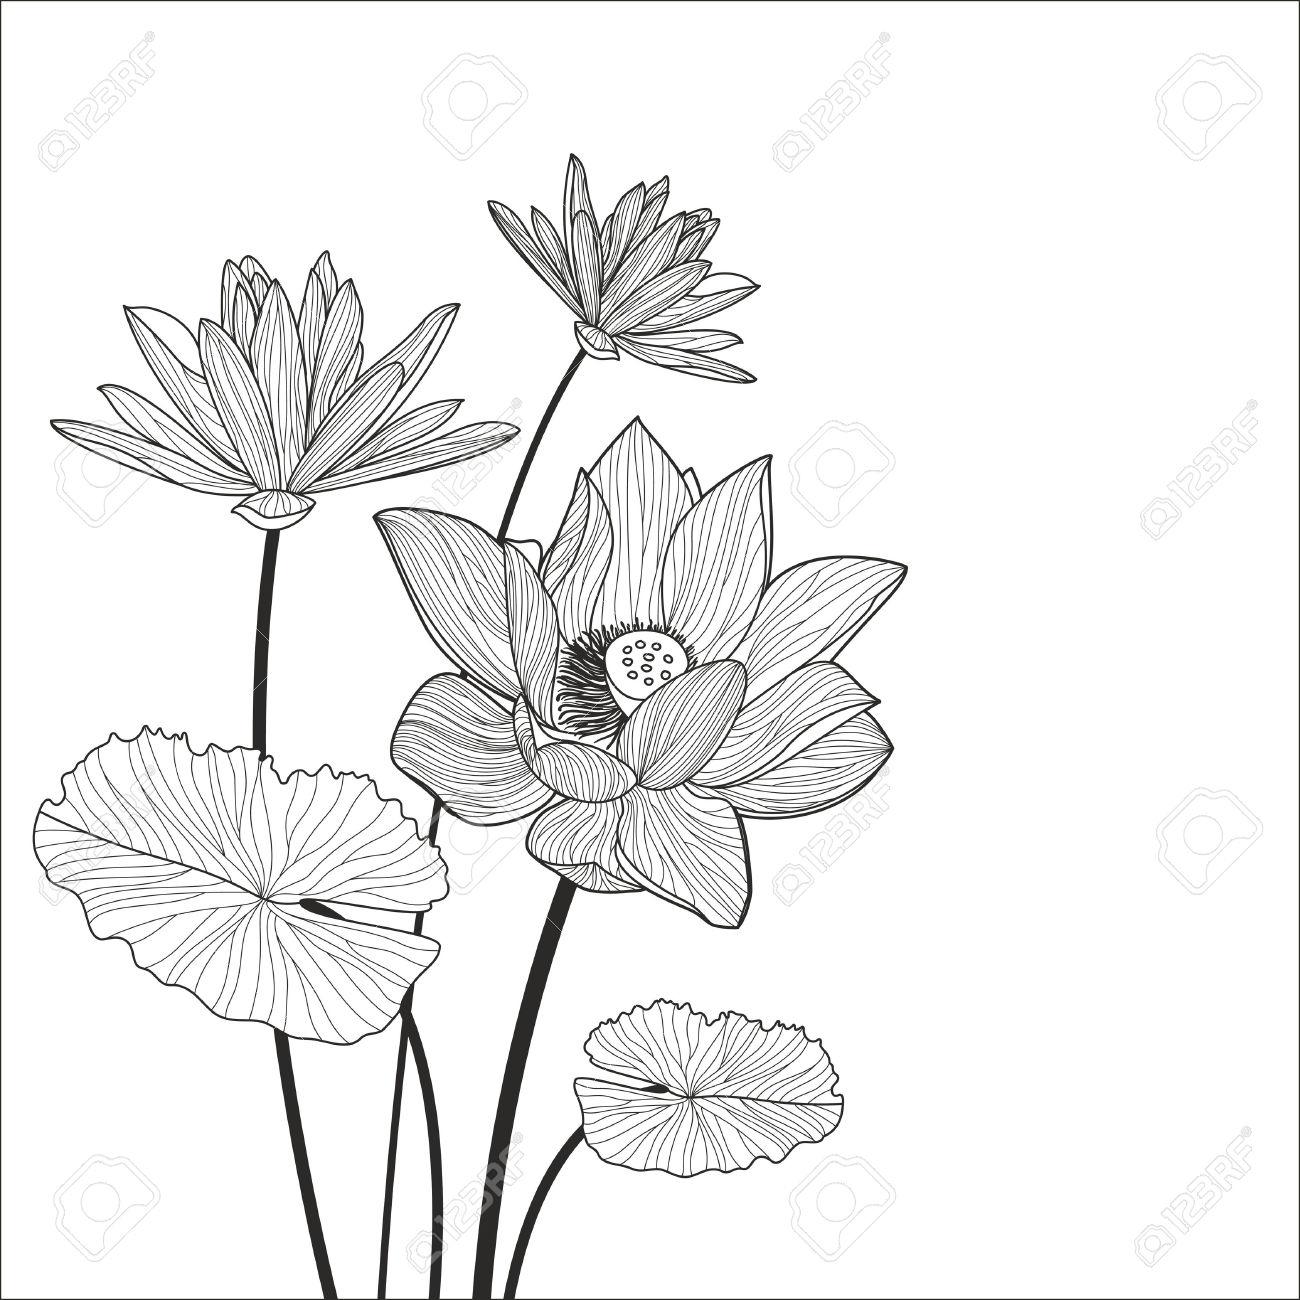 1300x1300 Lotus Flower Line Drawing Beautiful Lotus Flower Line Illustration